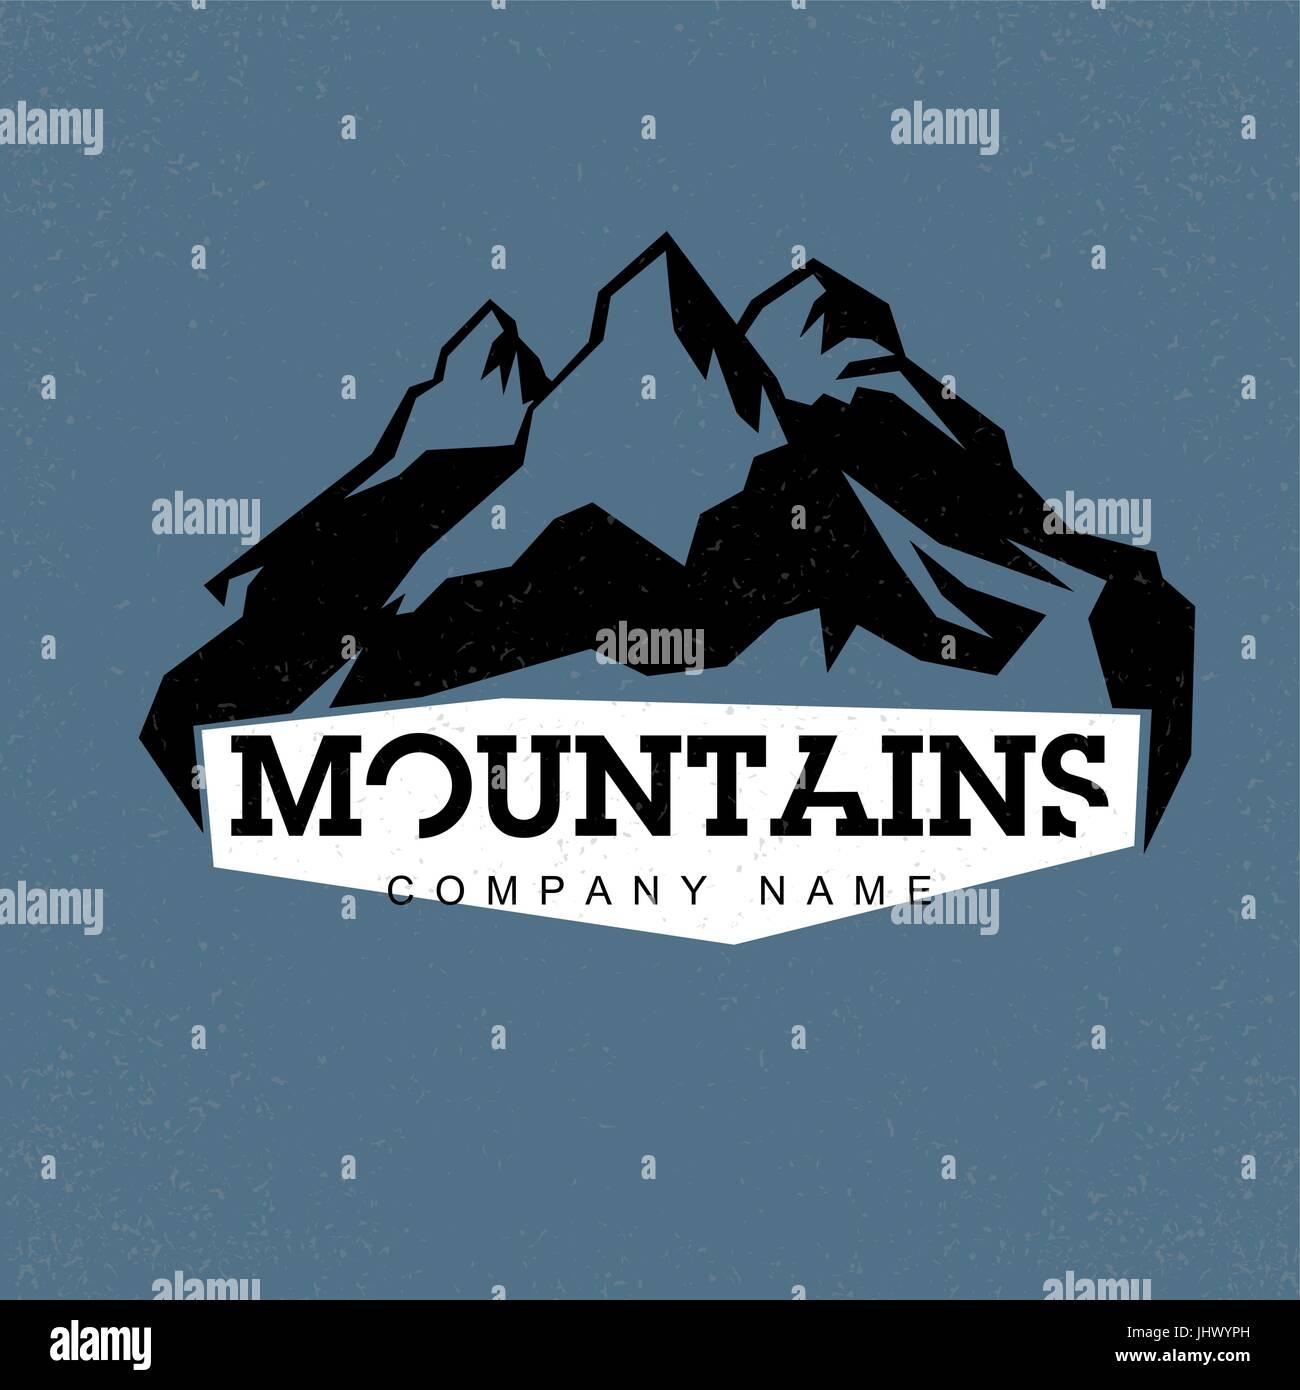 mountains logo template stockfotos mountains logo template bilder alamy. Black Bedroom Furniture Sets. Home Design Ideas